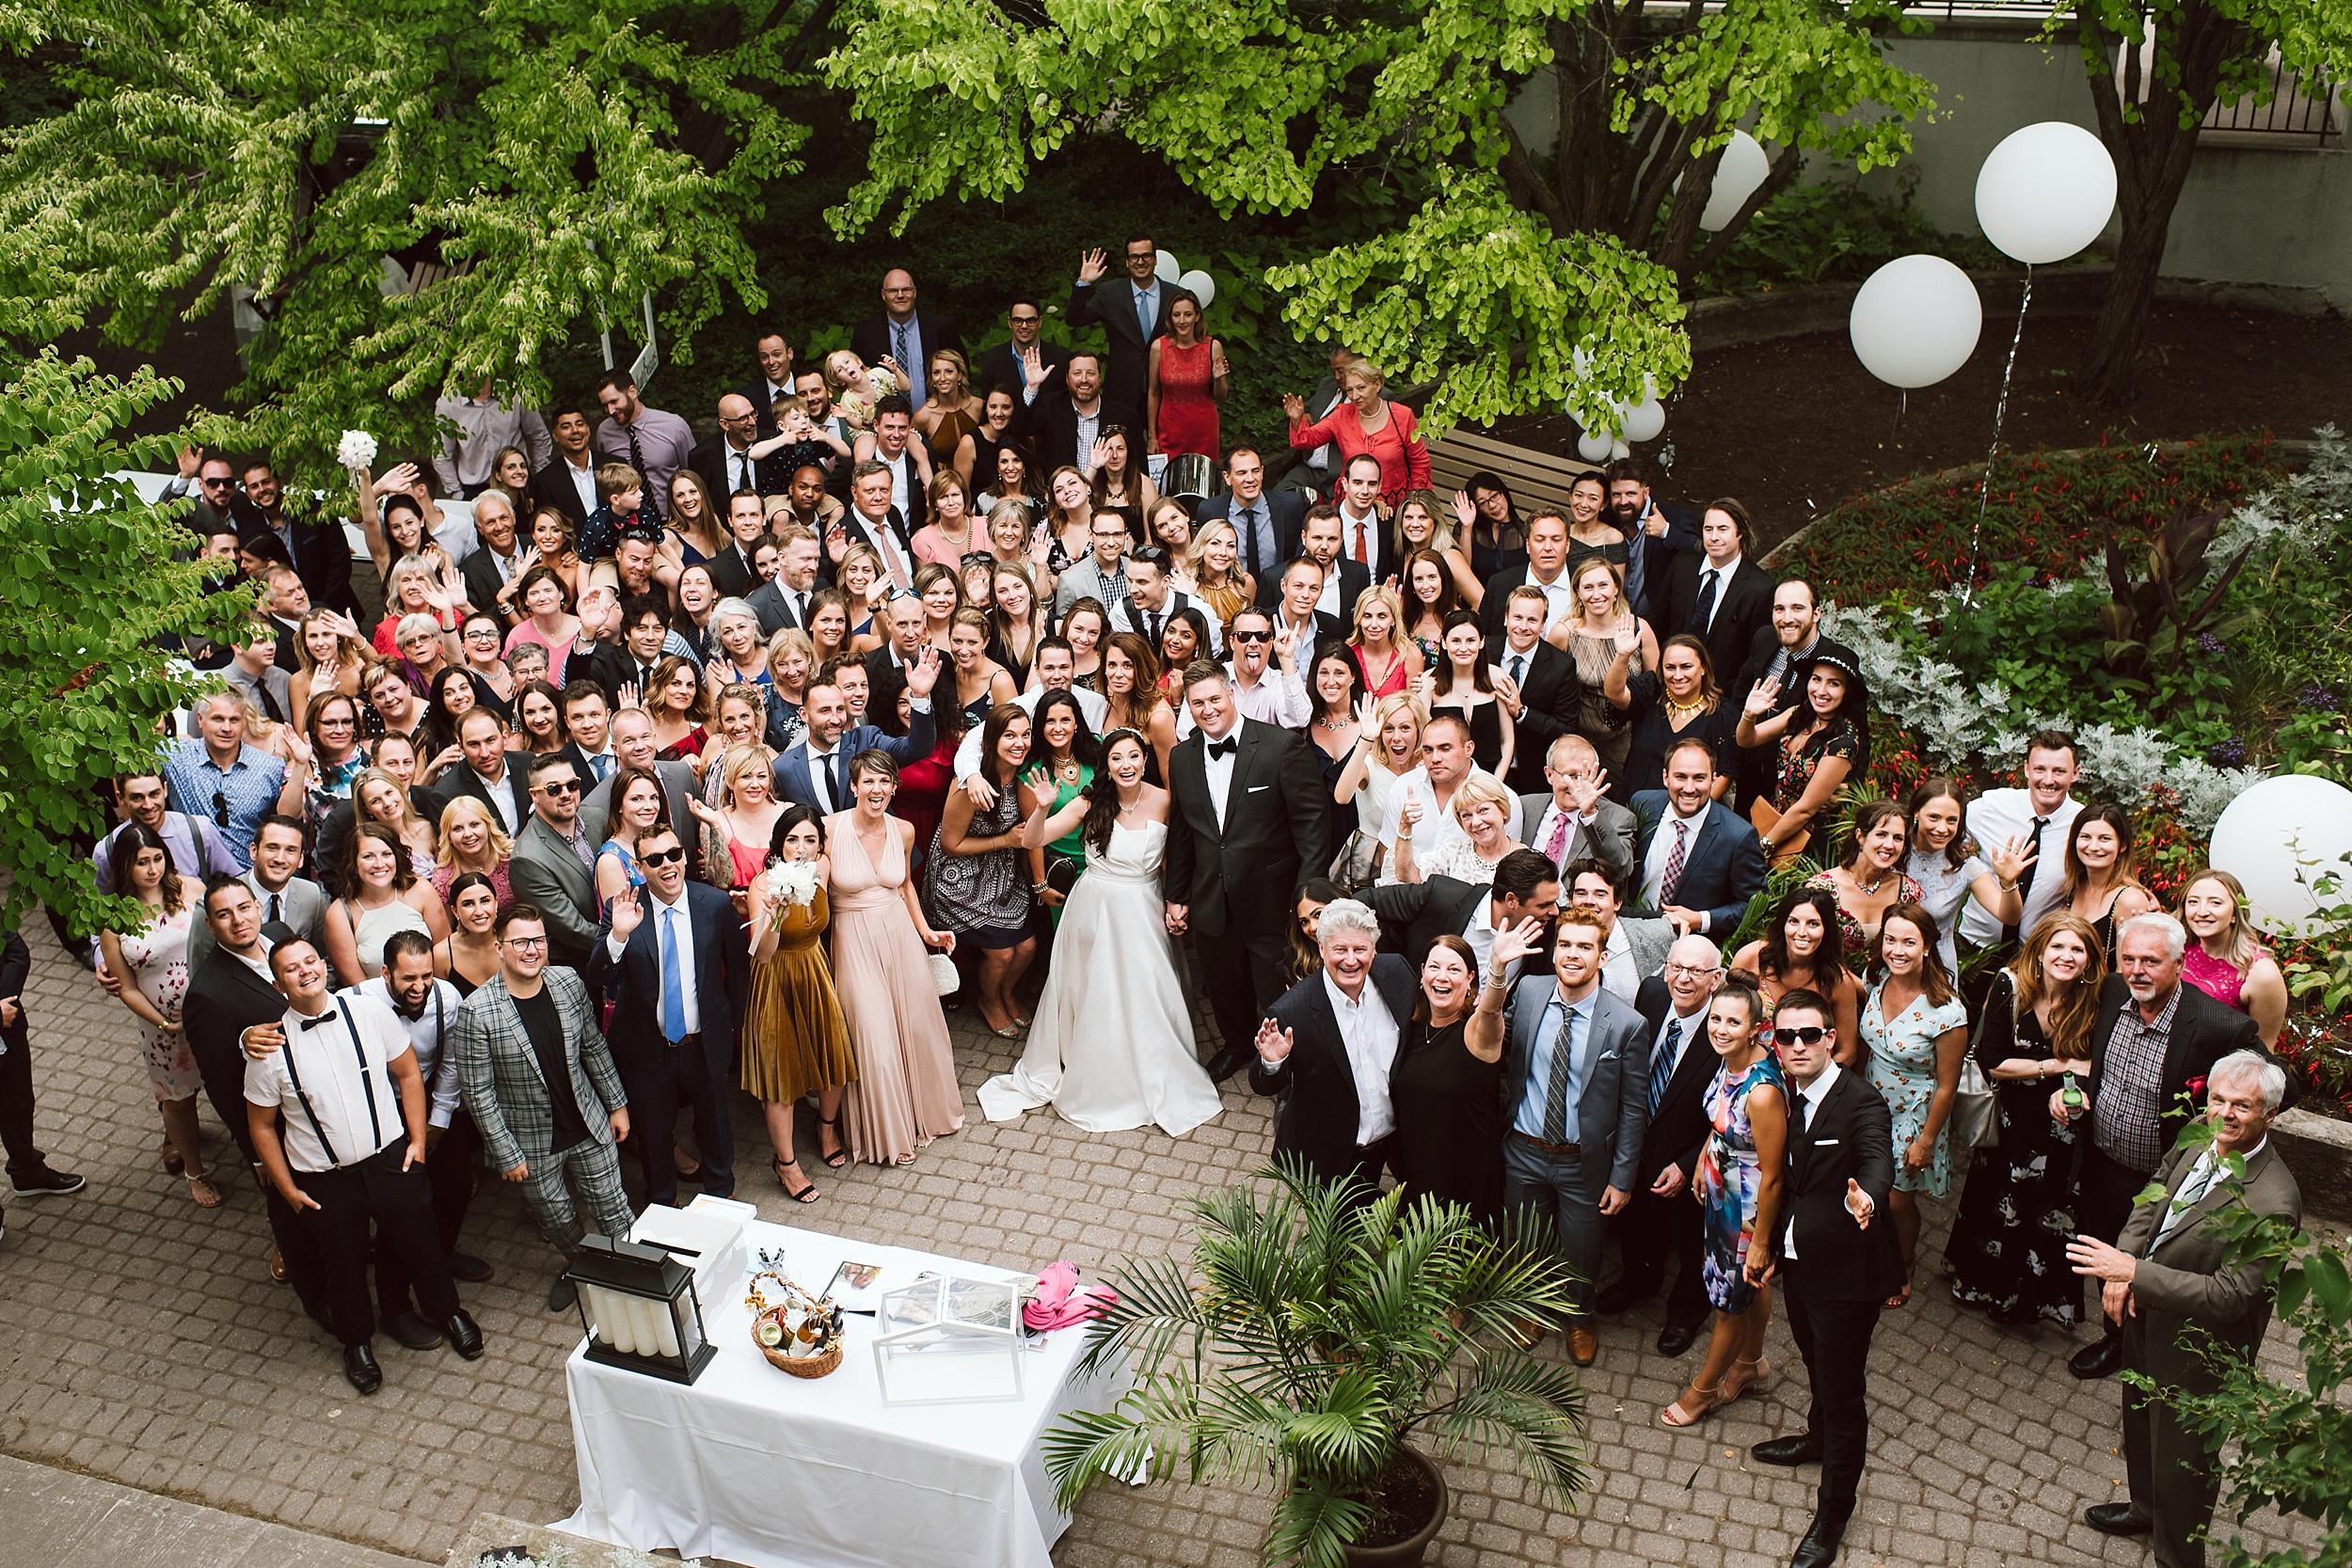 Sunnyside_Pavilion_Wedding_Toronto_Photographer_0102.jpg